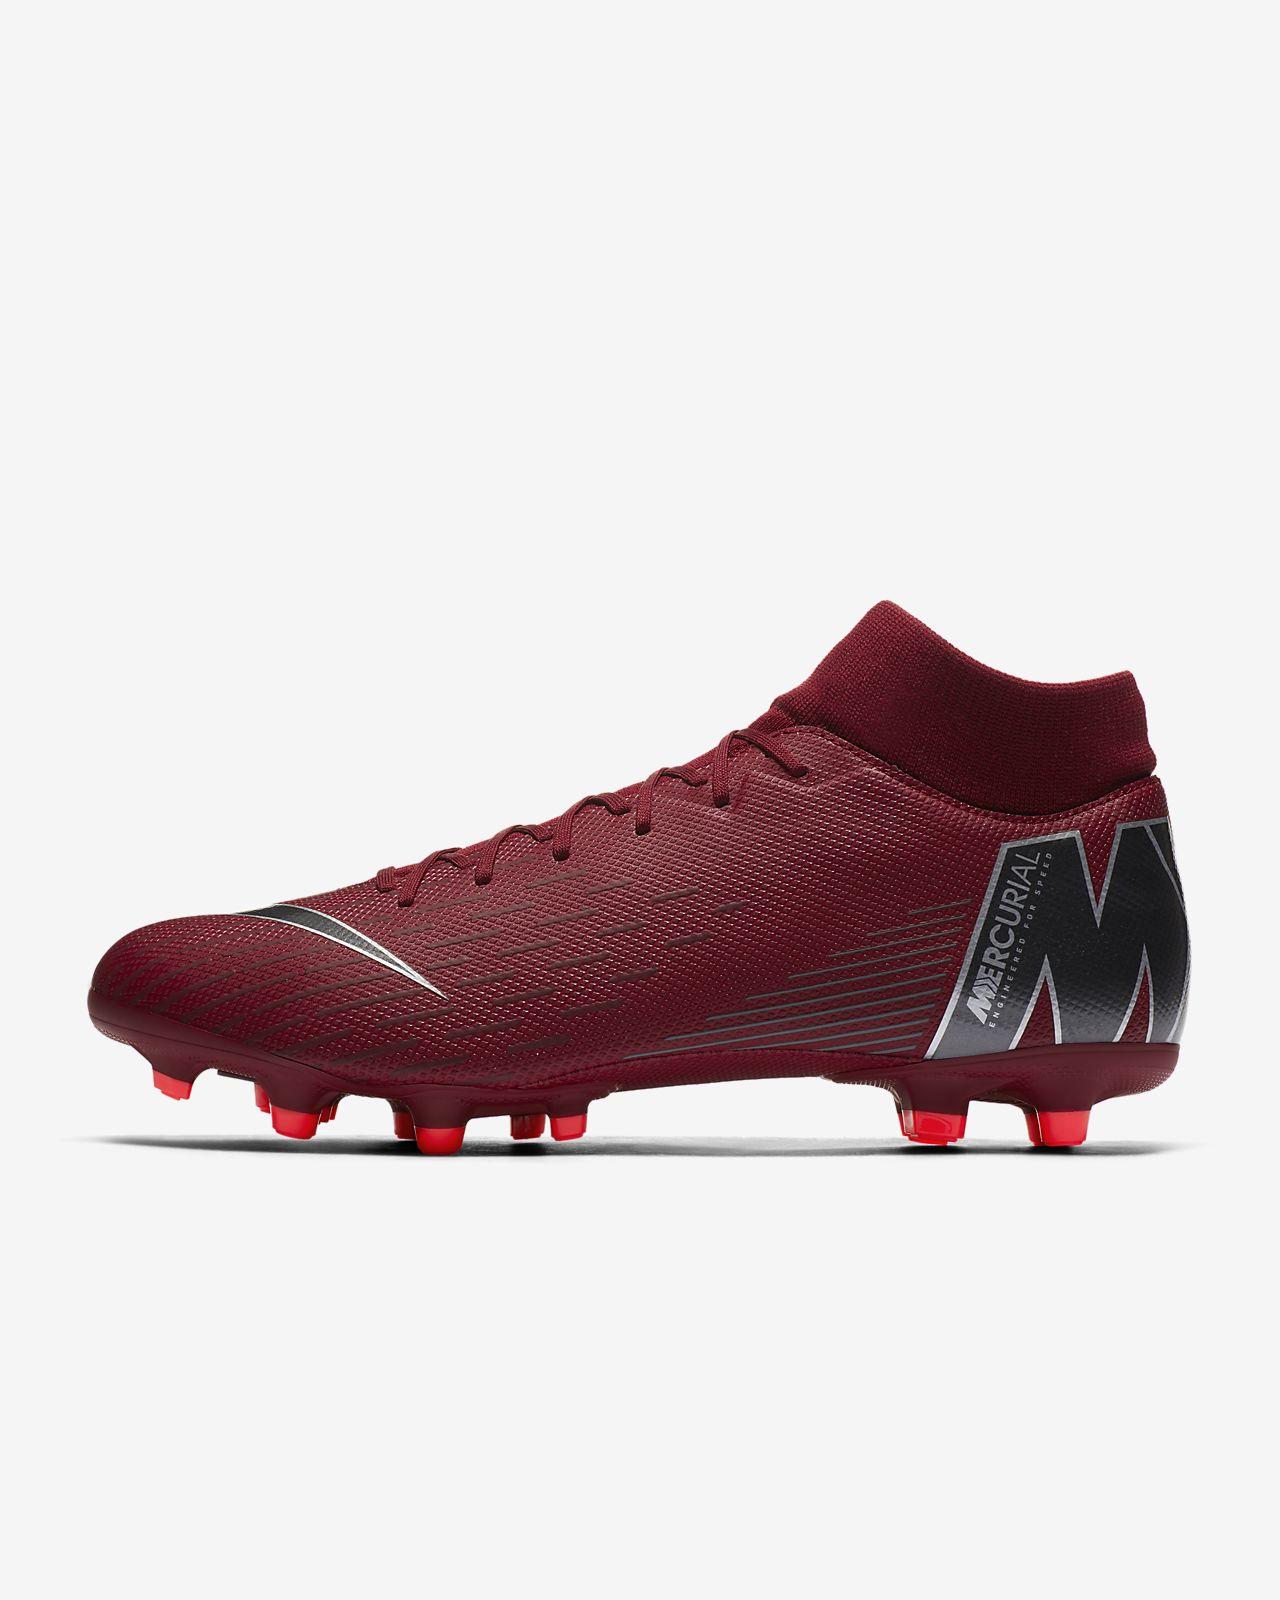 Nike Mercurial Superfly VI Academy MG Multi-Ground Soccer ...